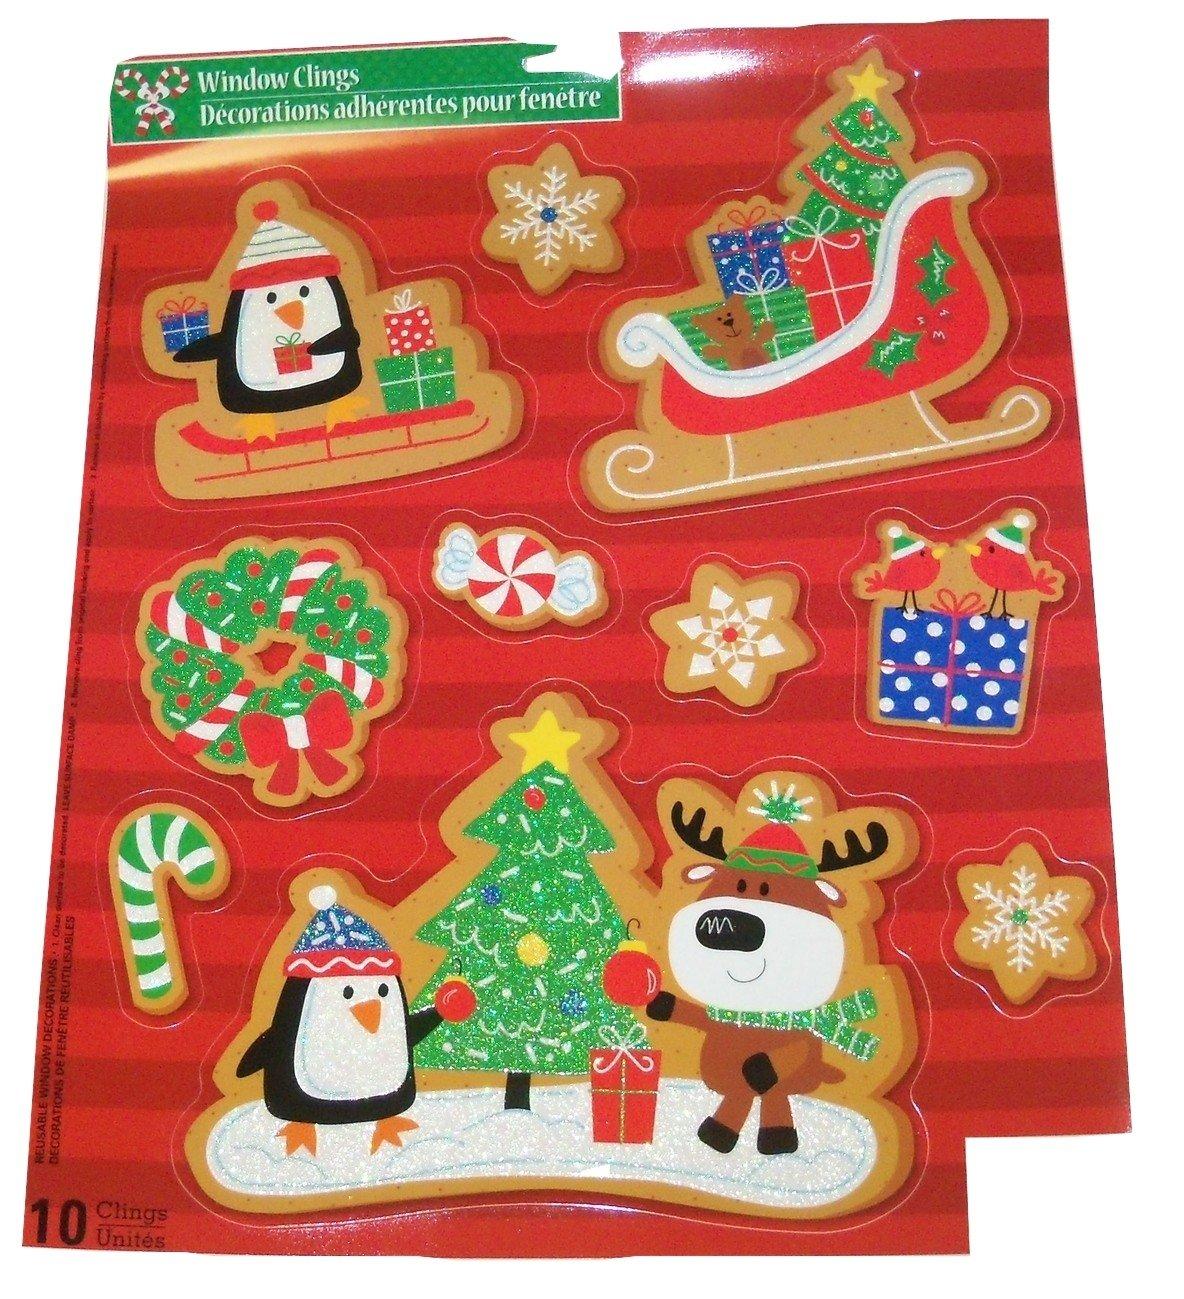 Christmas Reusable Glitter Window Clings ~ Forest Animal Celebration (10 Clings, 1 Sheet)